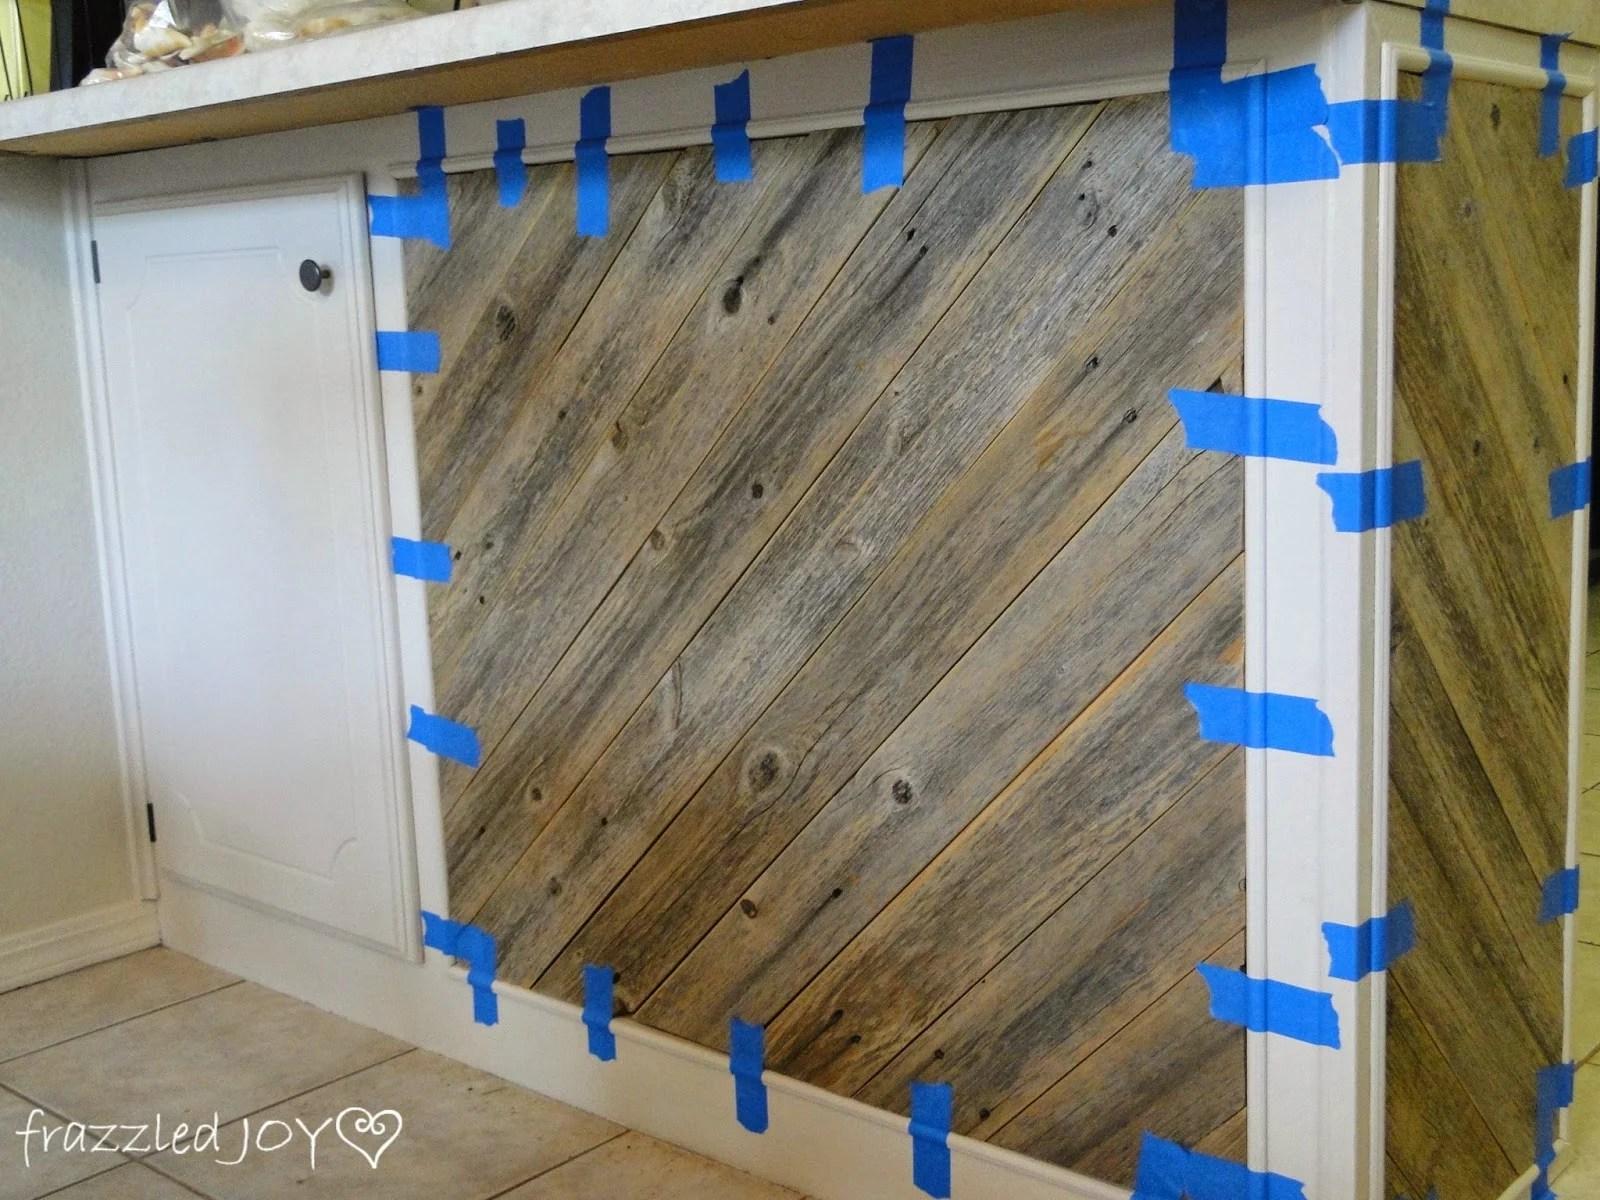 adding trim to reclaimed wood plank kitchen island frazzled joy on remodelaholic remodelaholic   diagonal planked reclaimed wood kitchen island  rh   remodelaholic com